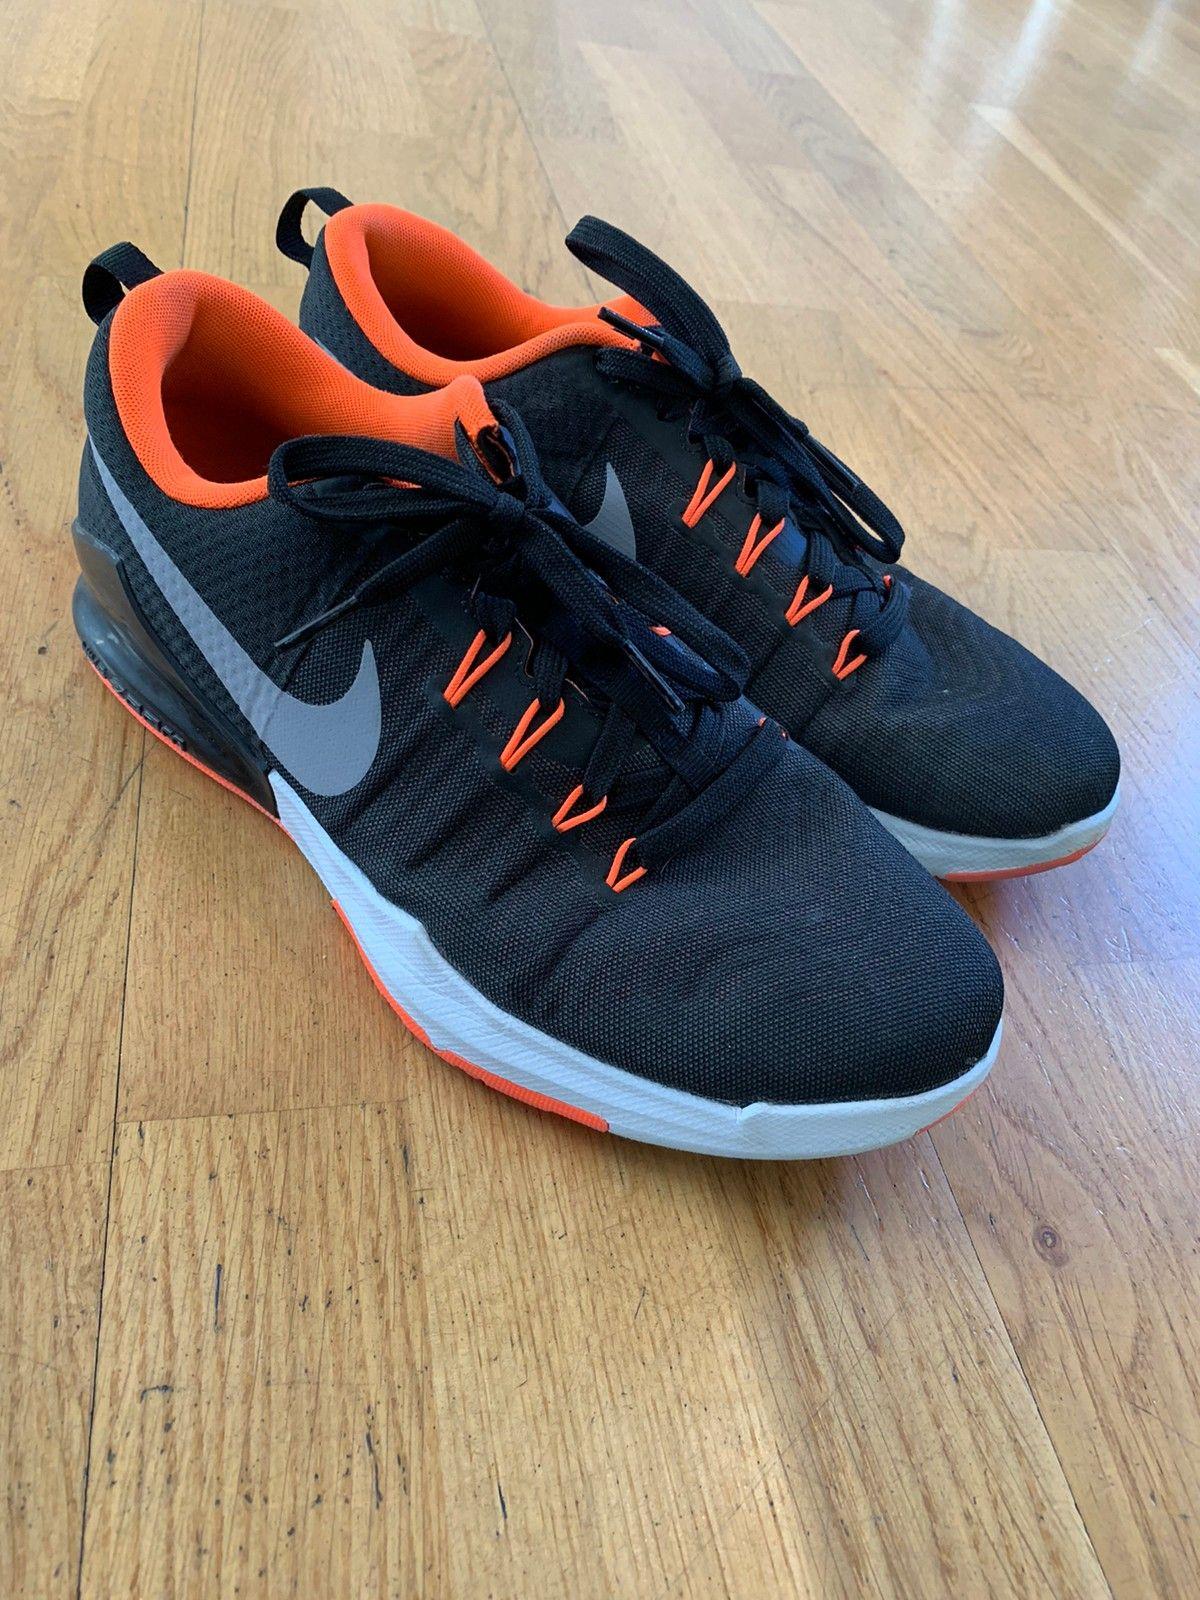 Nike sko str 47 | FINN.no